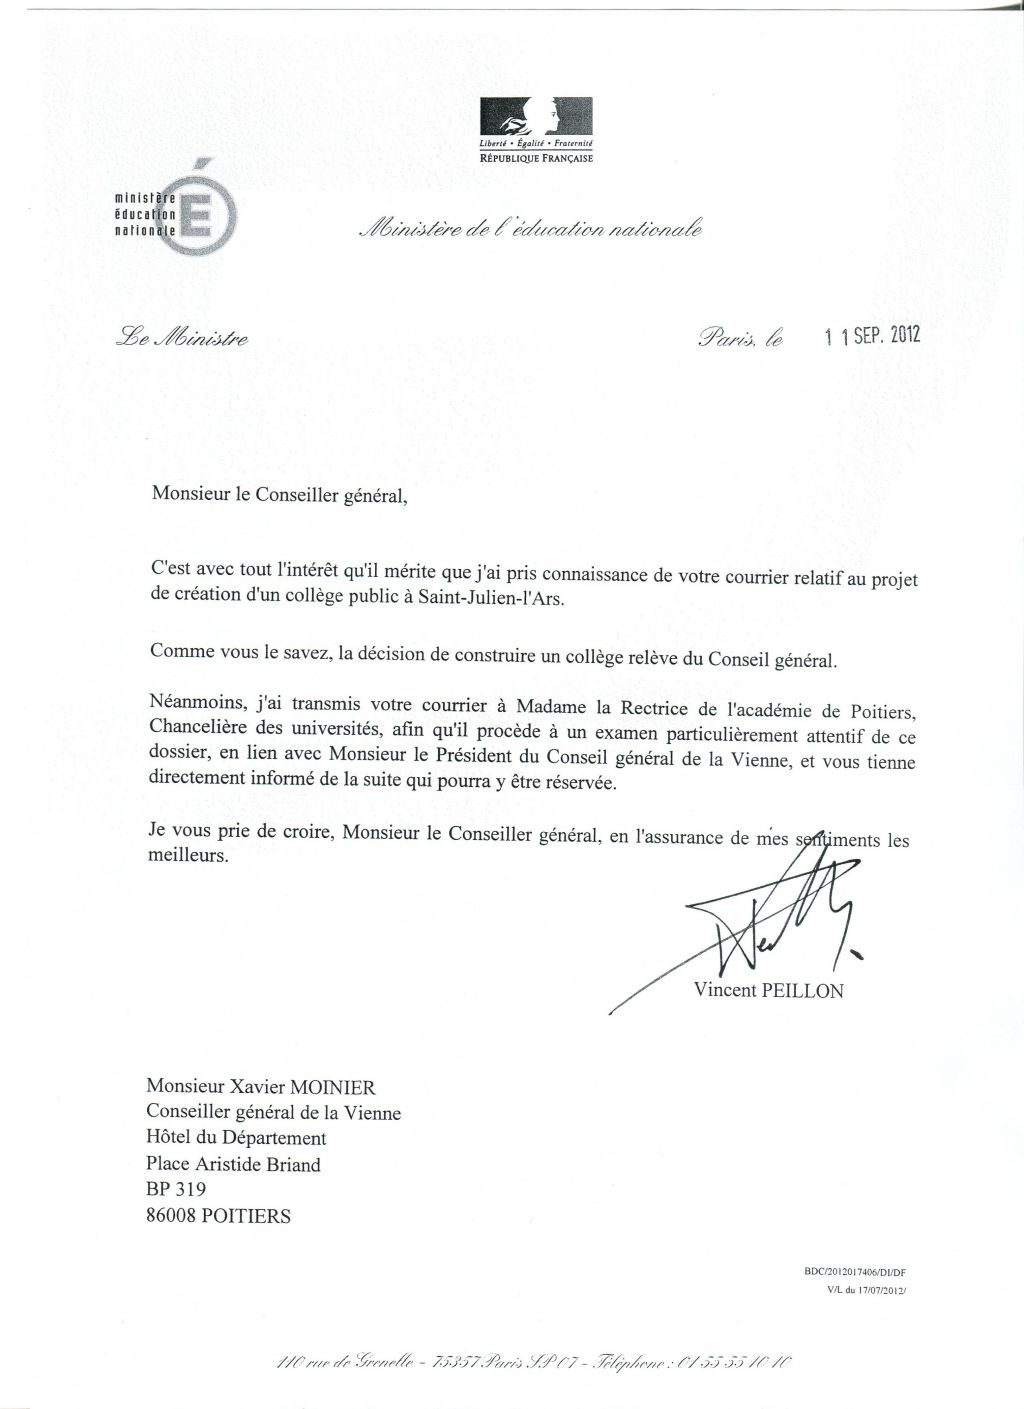 xaviermoinier-college-saint-julien-l-ars-lettre-peillon